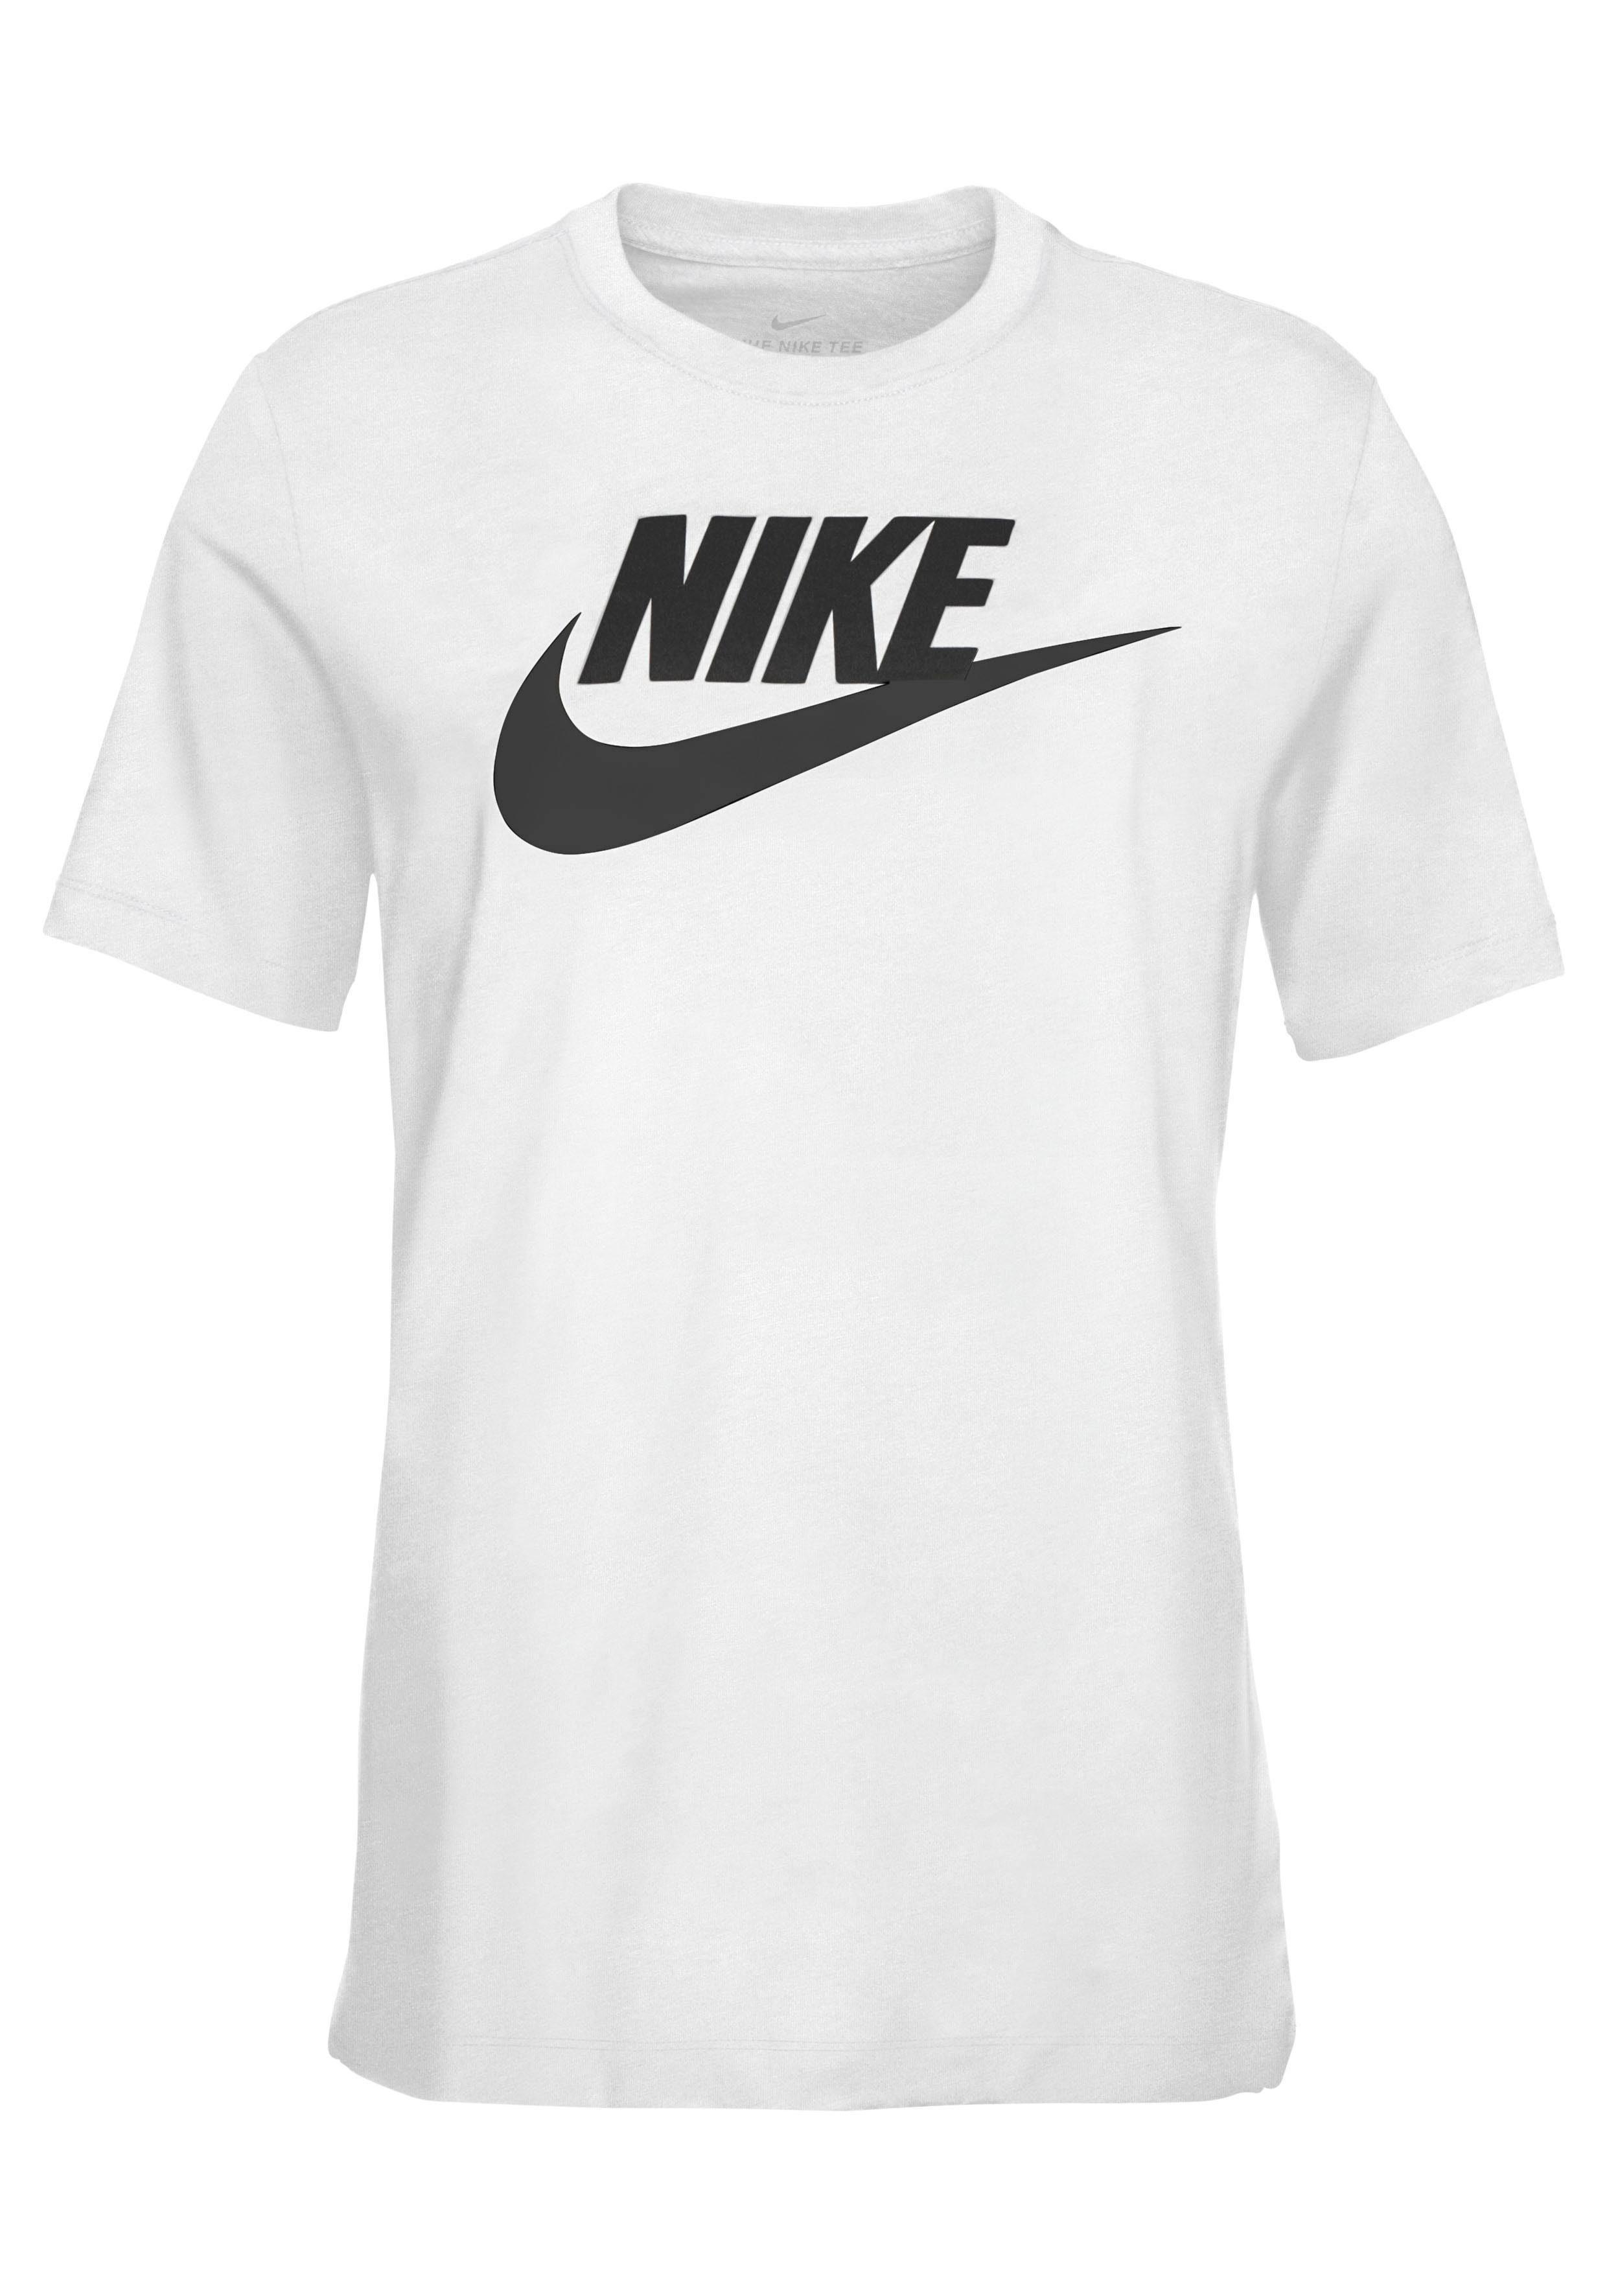 Nike Sportswear T Shirt »MEN NIKE SPORTSWEAR TEE ICON FUTURA« online kaufen | OTTO